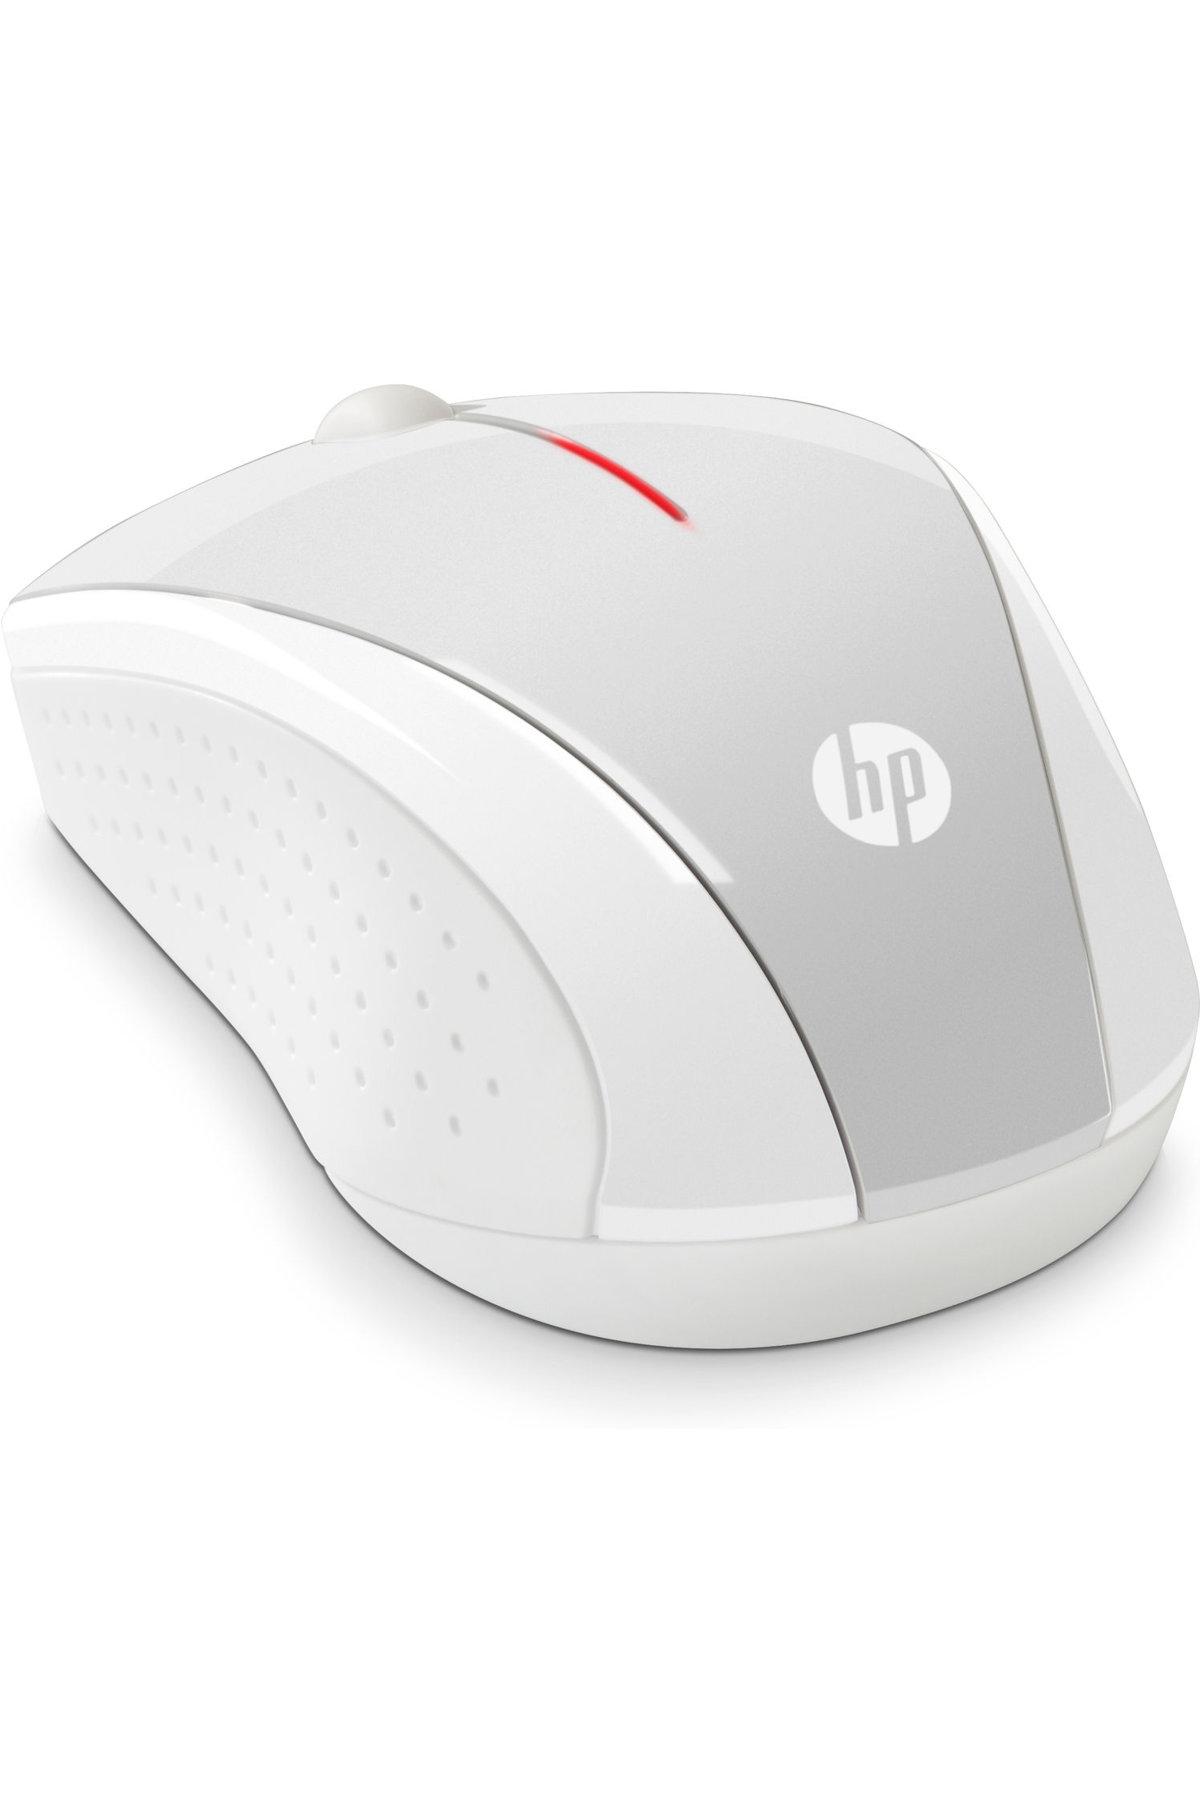 fdc1205b190 HP HP Wireless Mouse X3000 Pike Silver - 2HW68AA#ABB - Redcorp.com/en